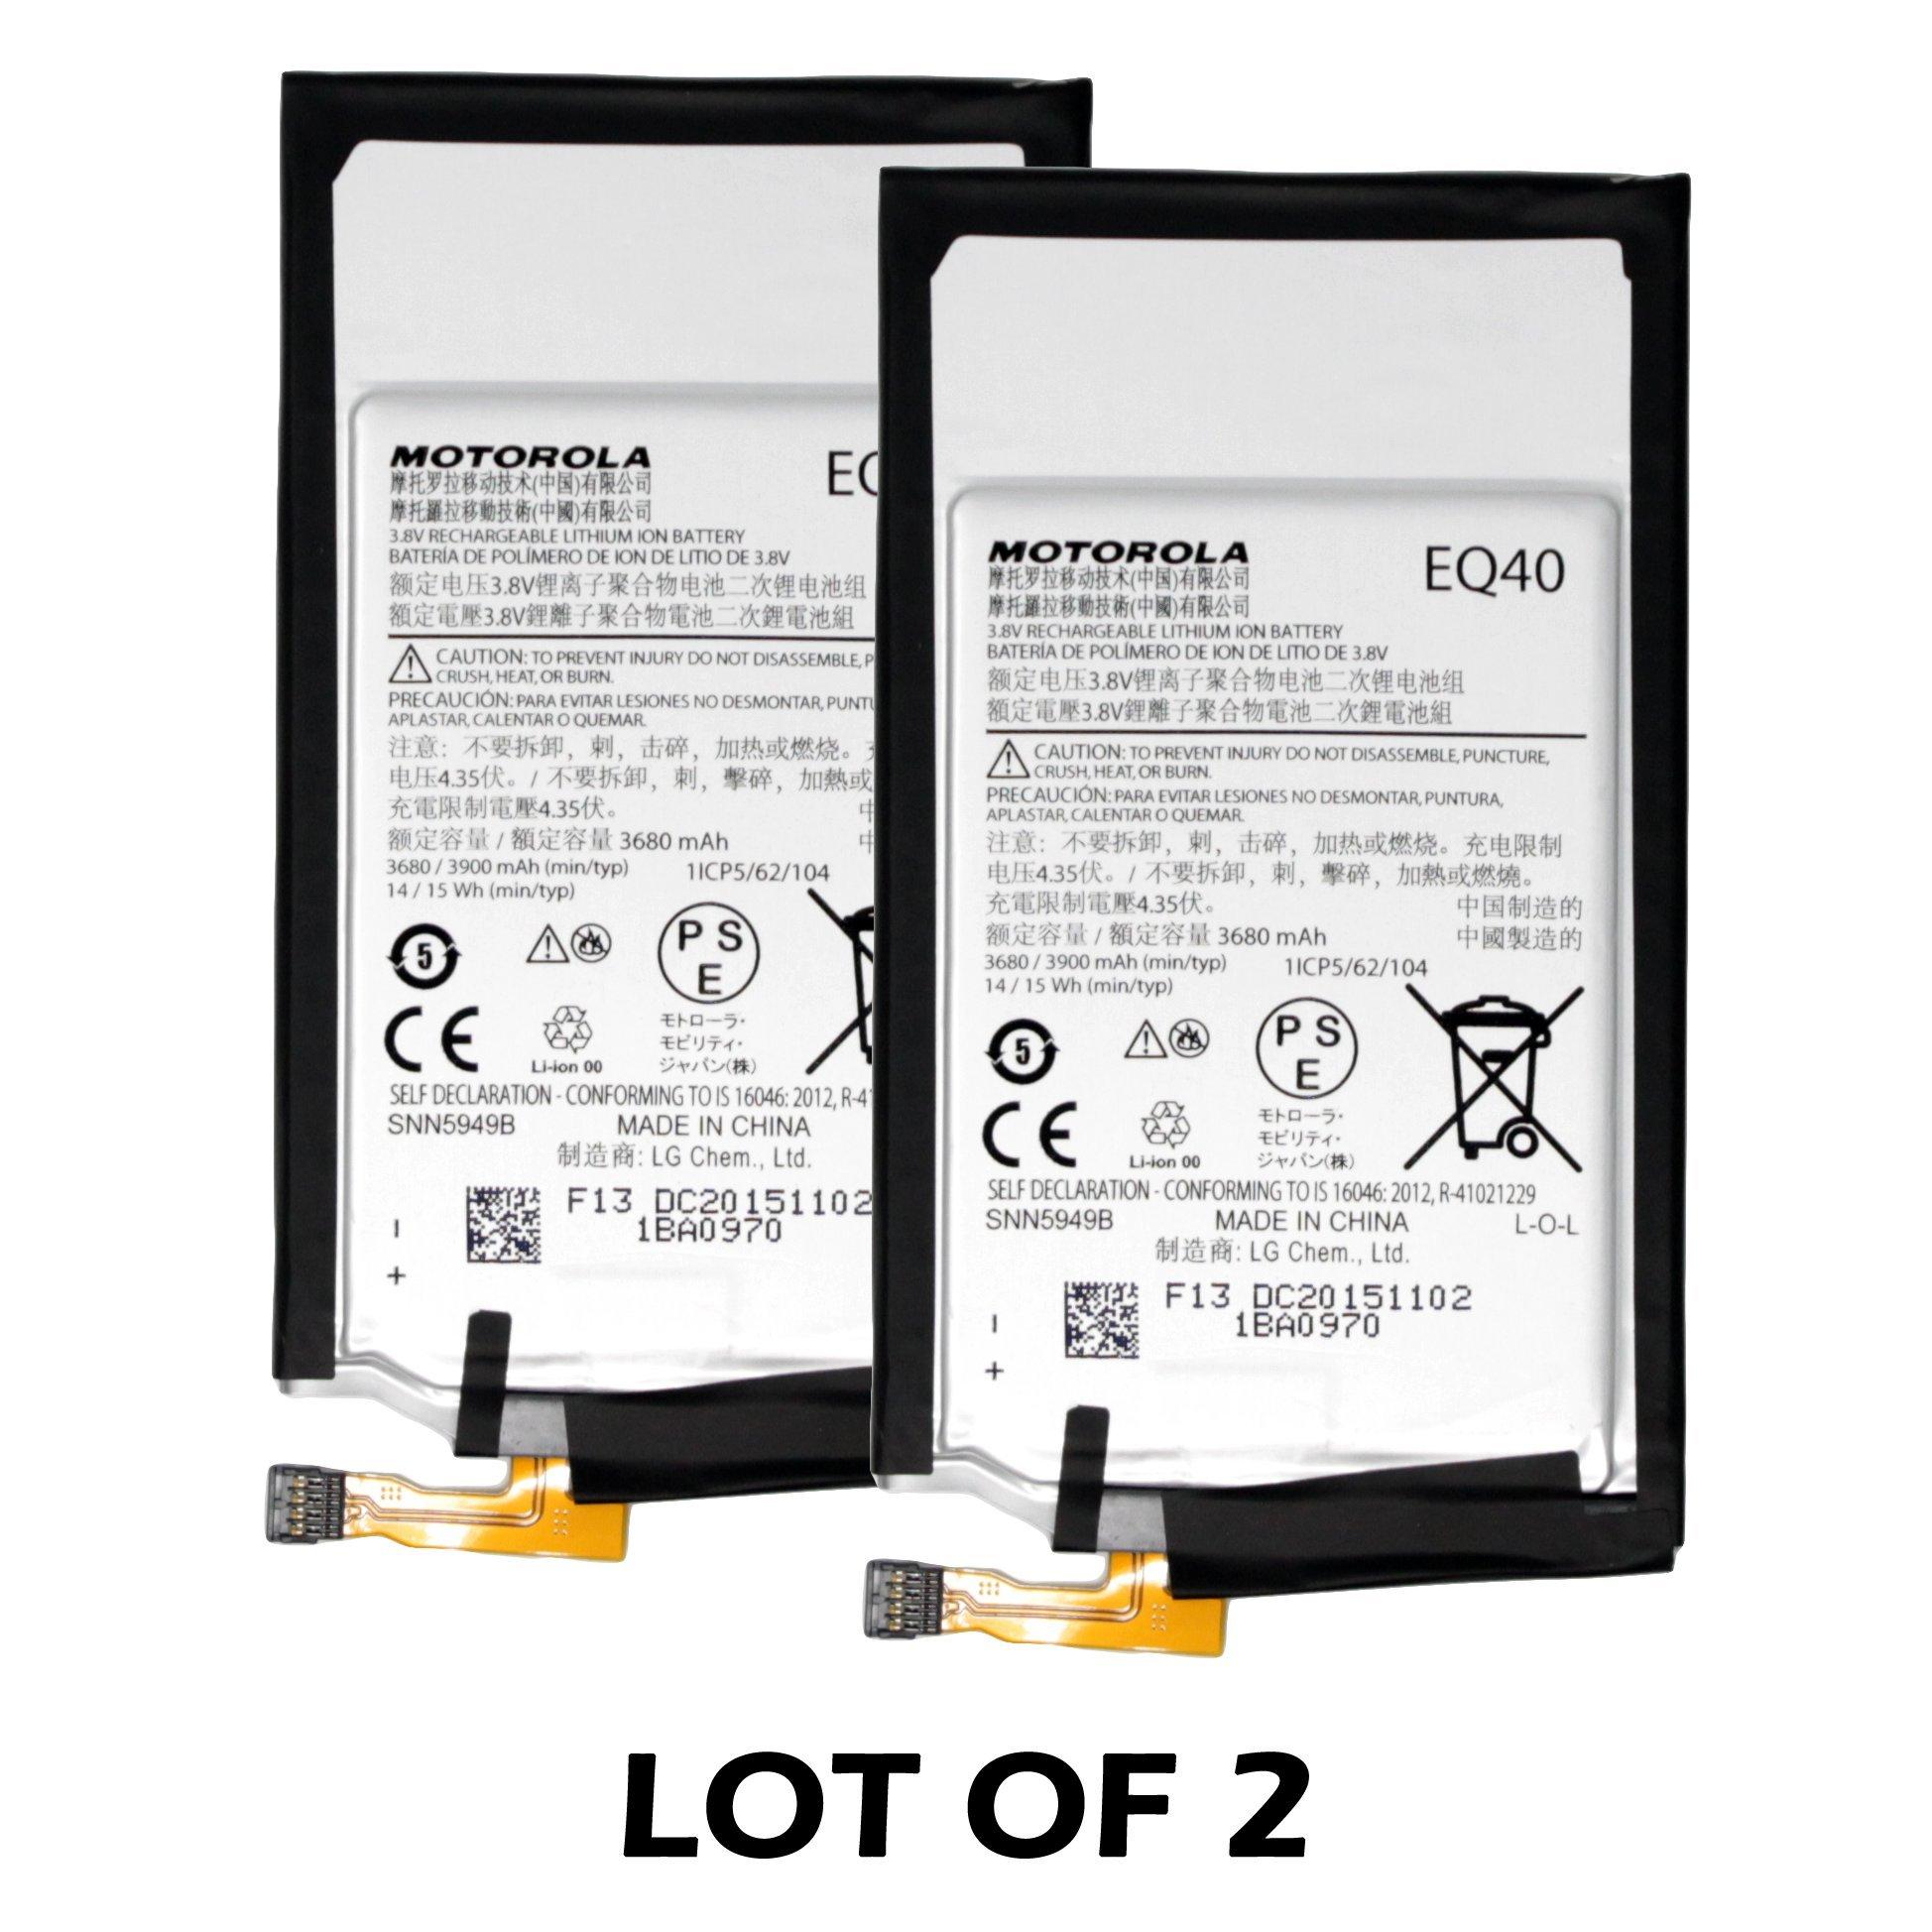 NEW Motorola EQ40 SNN5949B Battery (2-PC) 3900mAh for Motorola Droid Turbo Verizon XT1254 - 100% OEM - in Non-retail Package (USA Seller) by FPJ